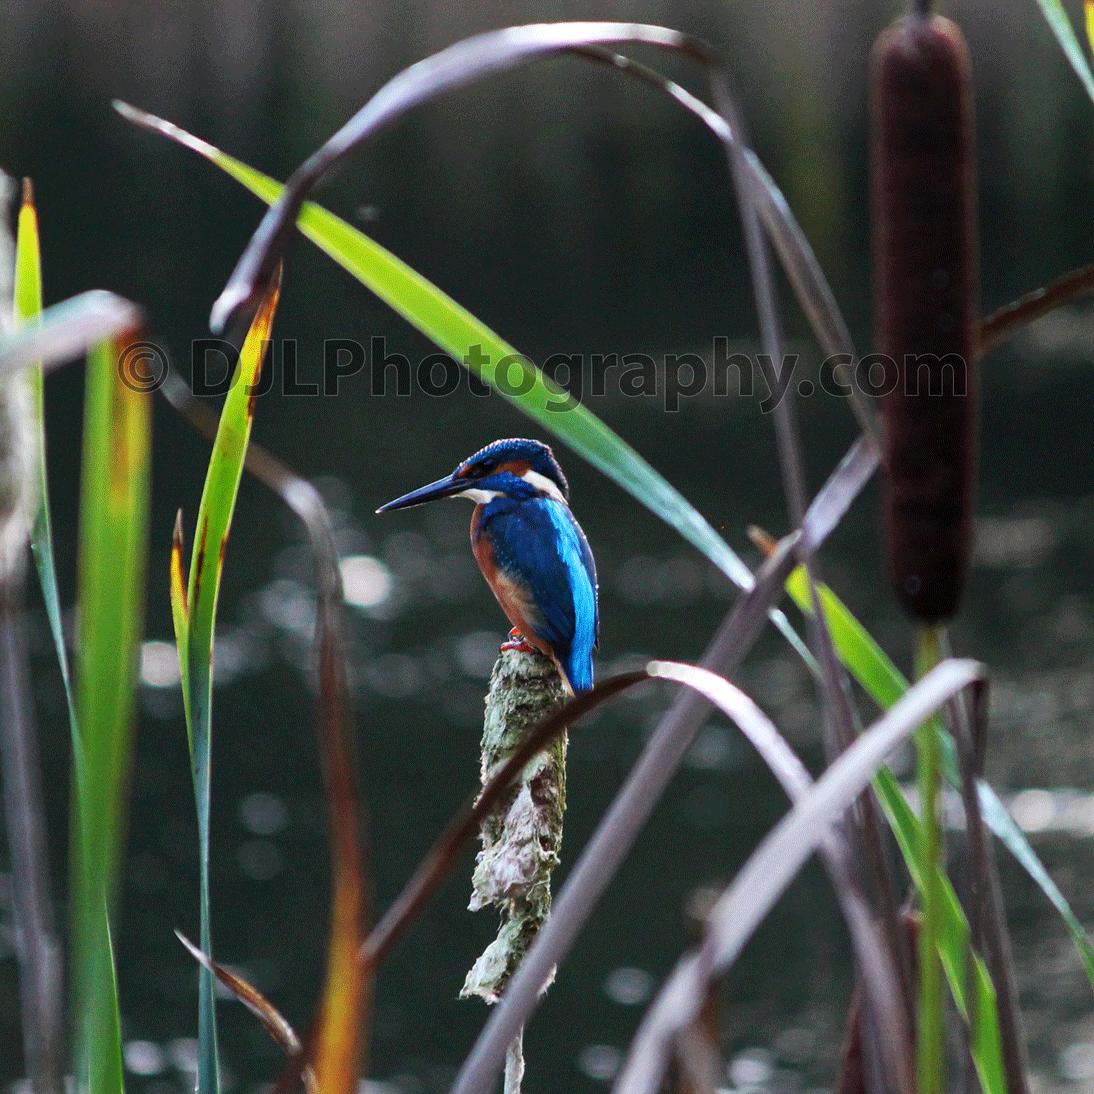 Kingfisher at Dunham